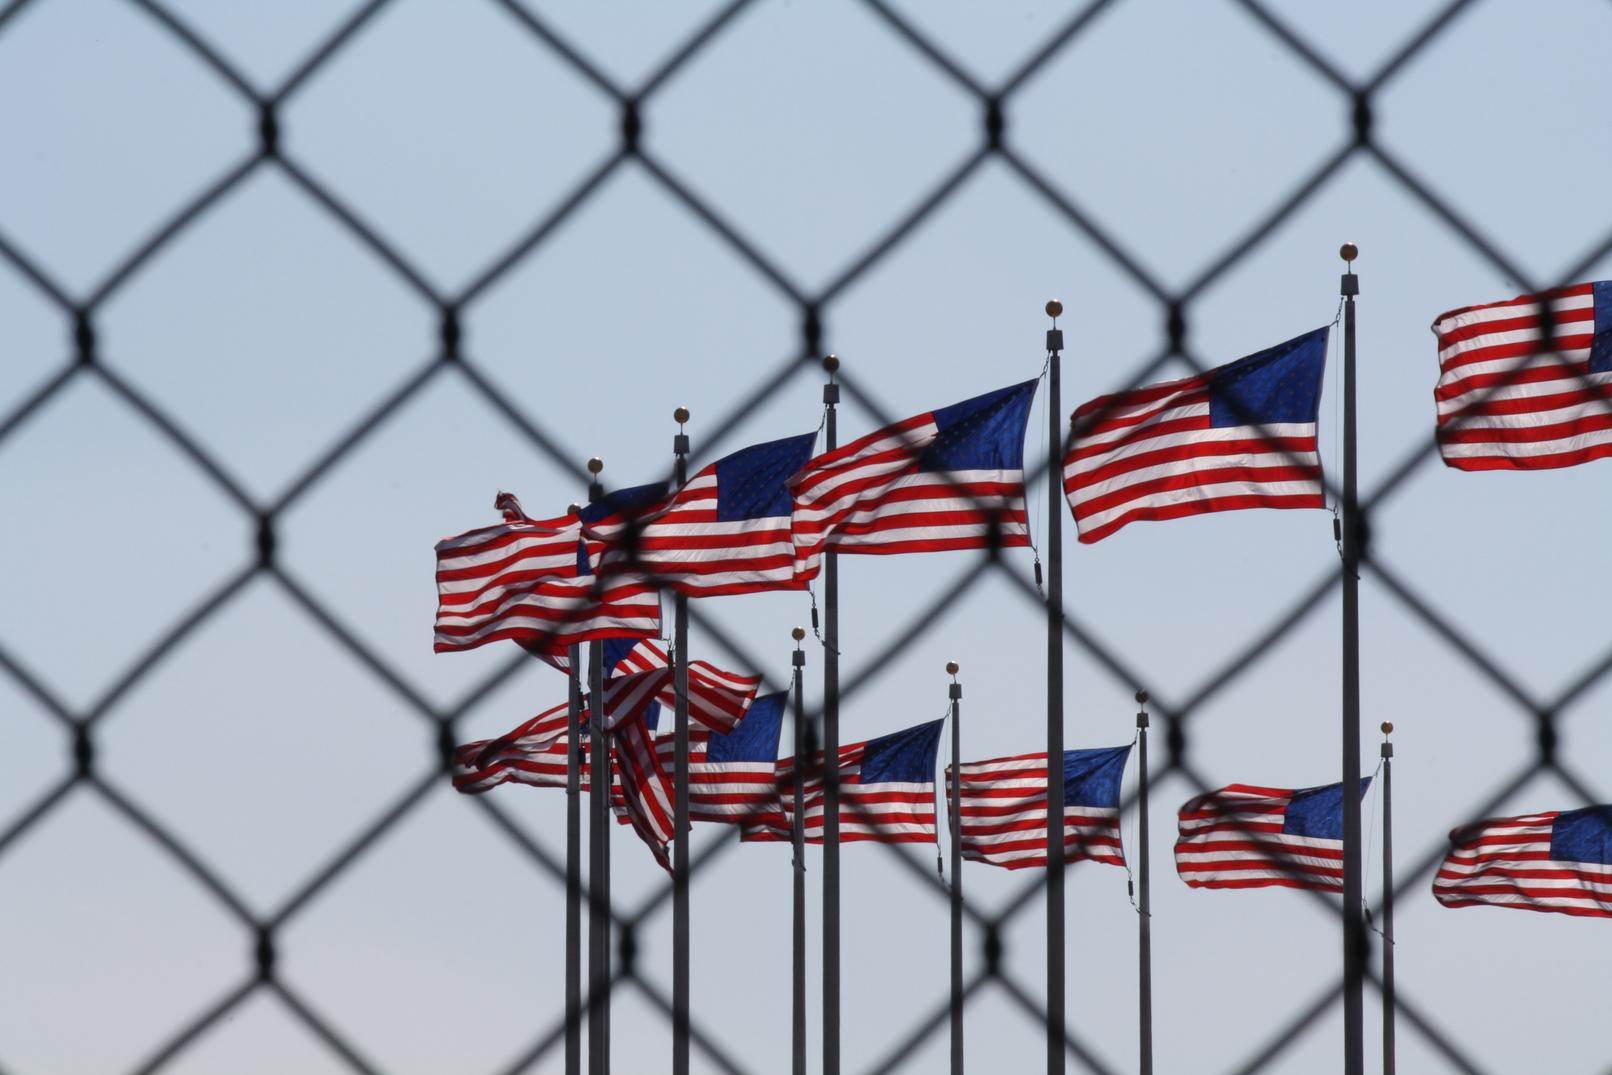 Order to Restore DACA Upheld by Federal Judge